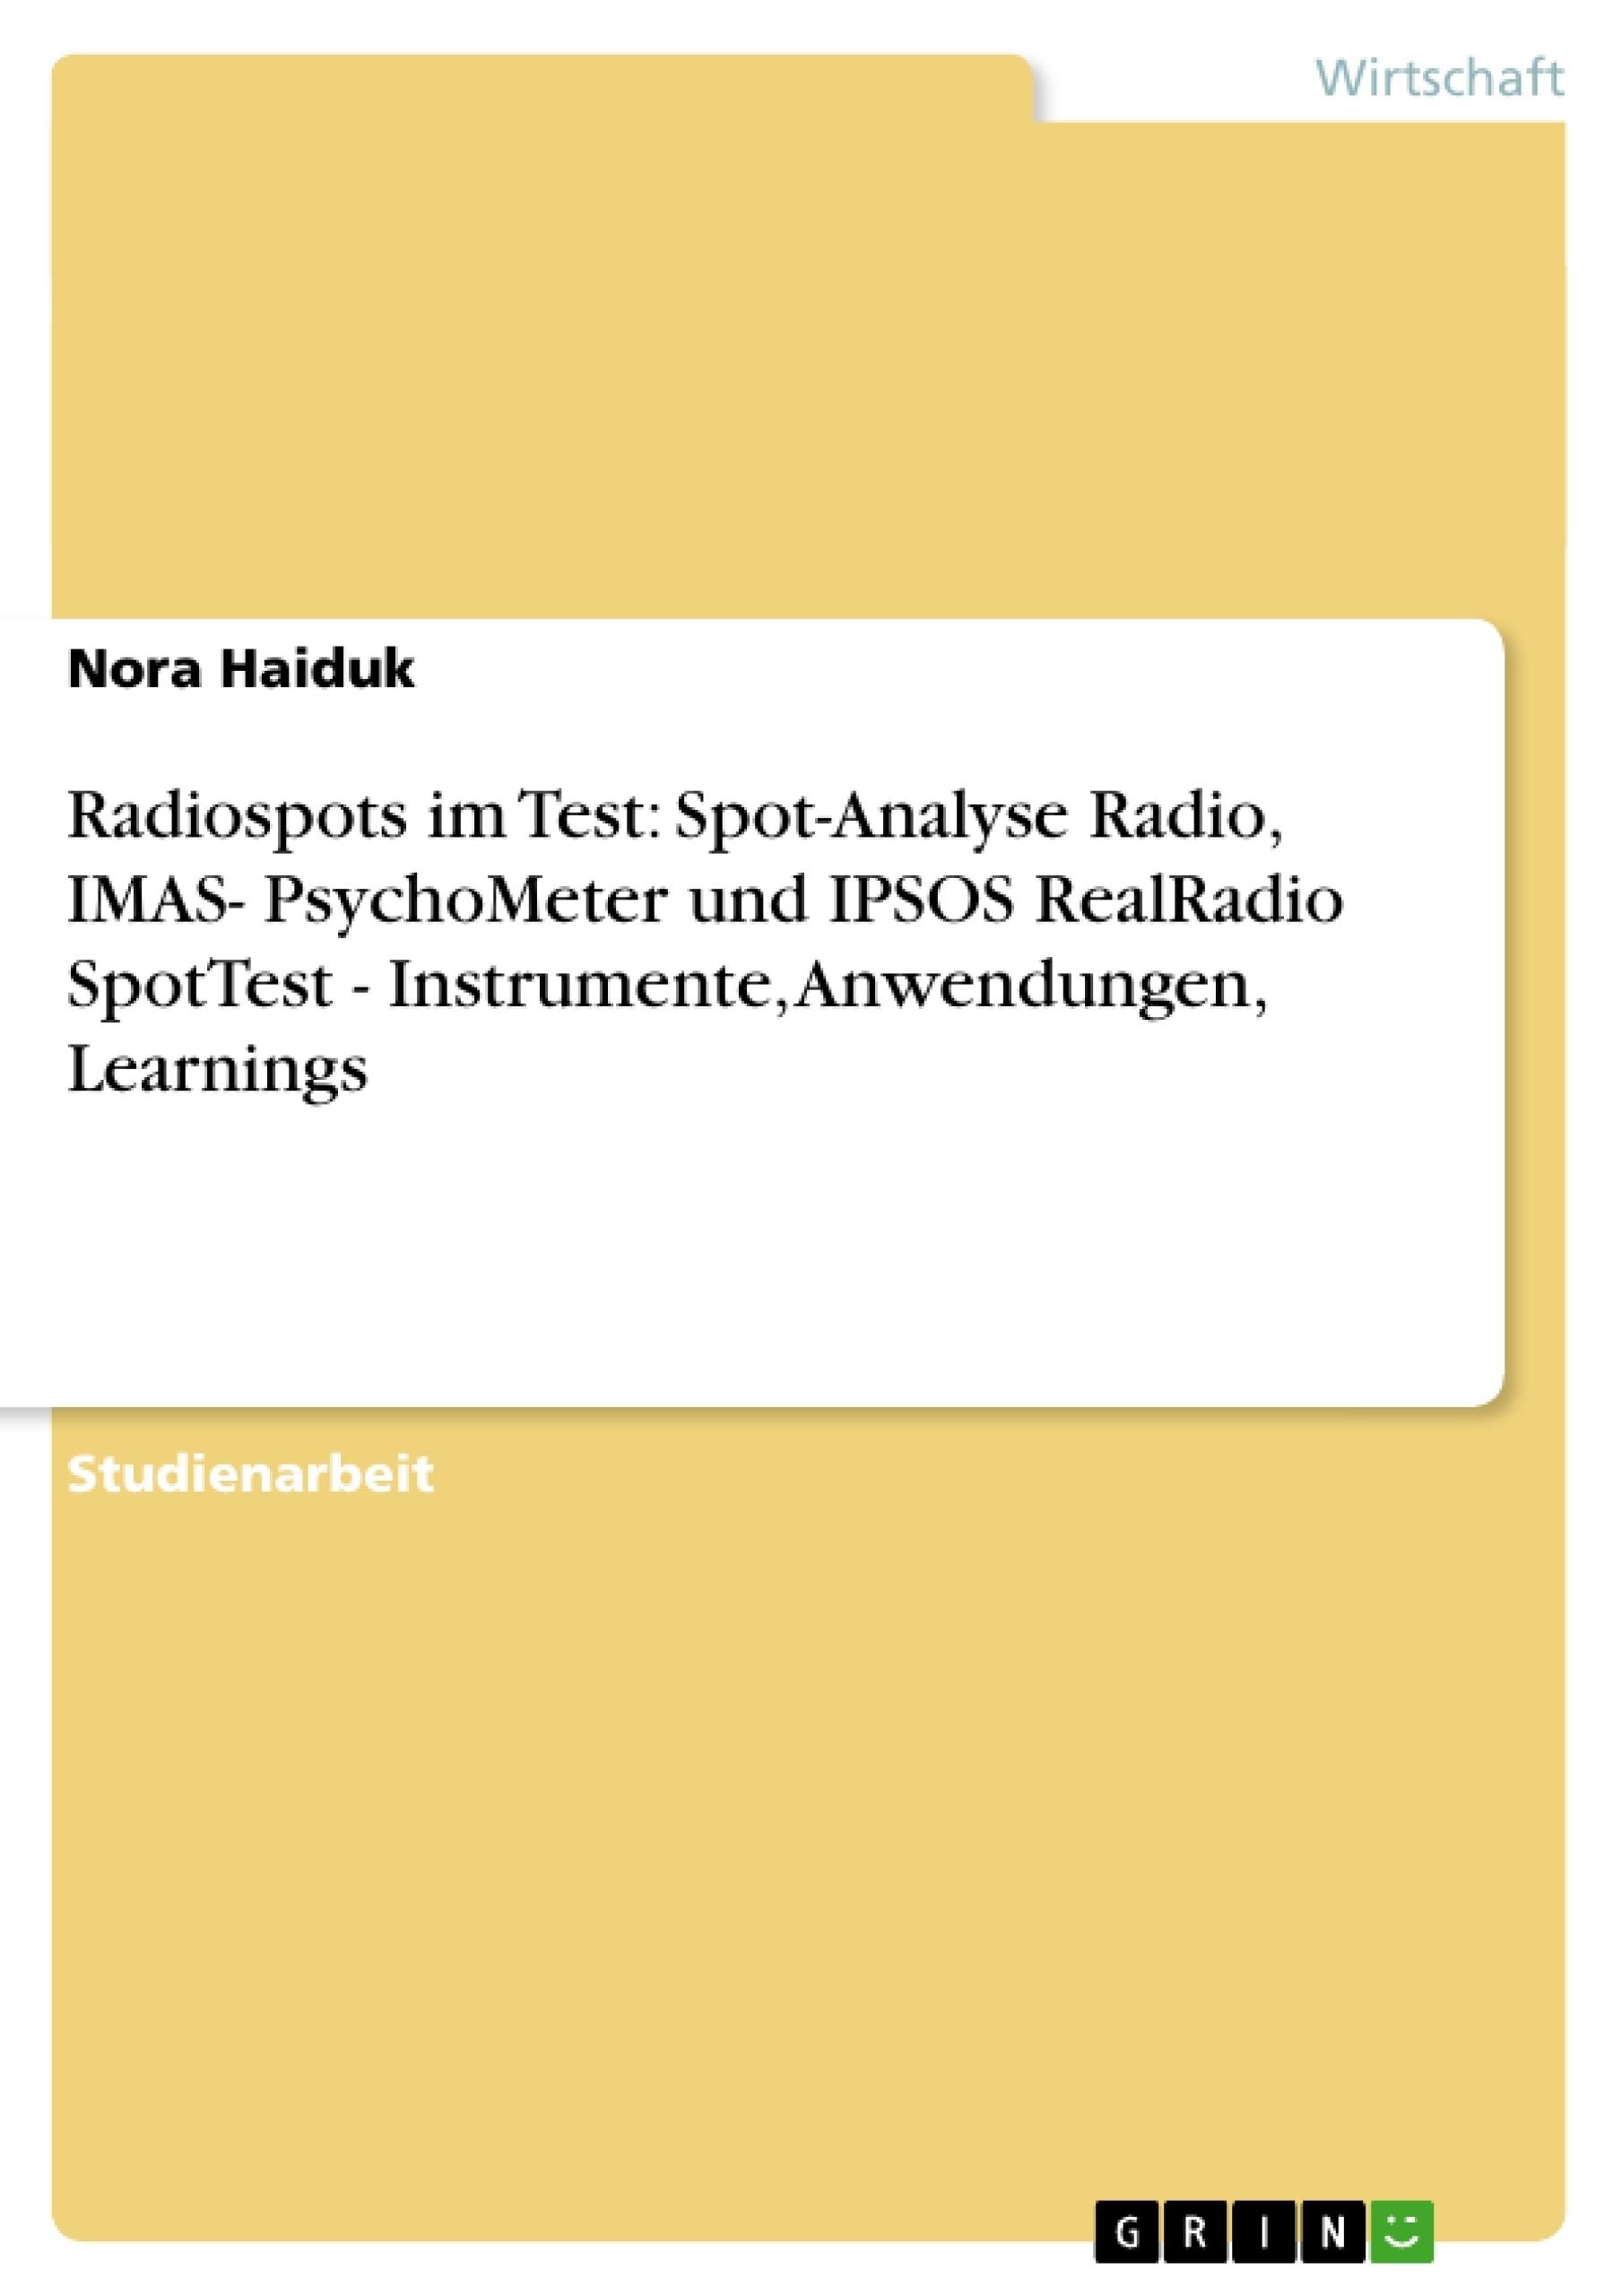 Titel: Radiospots im Test: Spot-Analyse Radio, IMAS- PsychoMeter und IPSOS RealRadio SpotTest - Instrumente, Anwendungen, Learnings